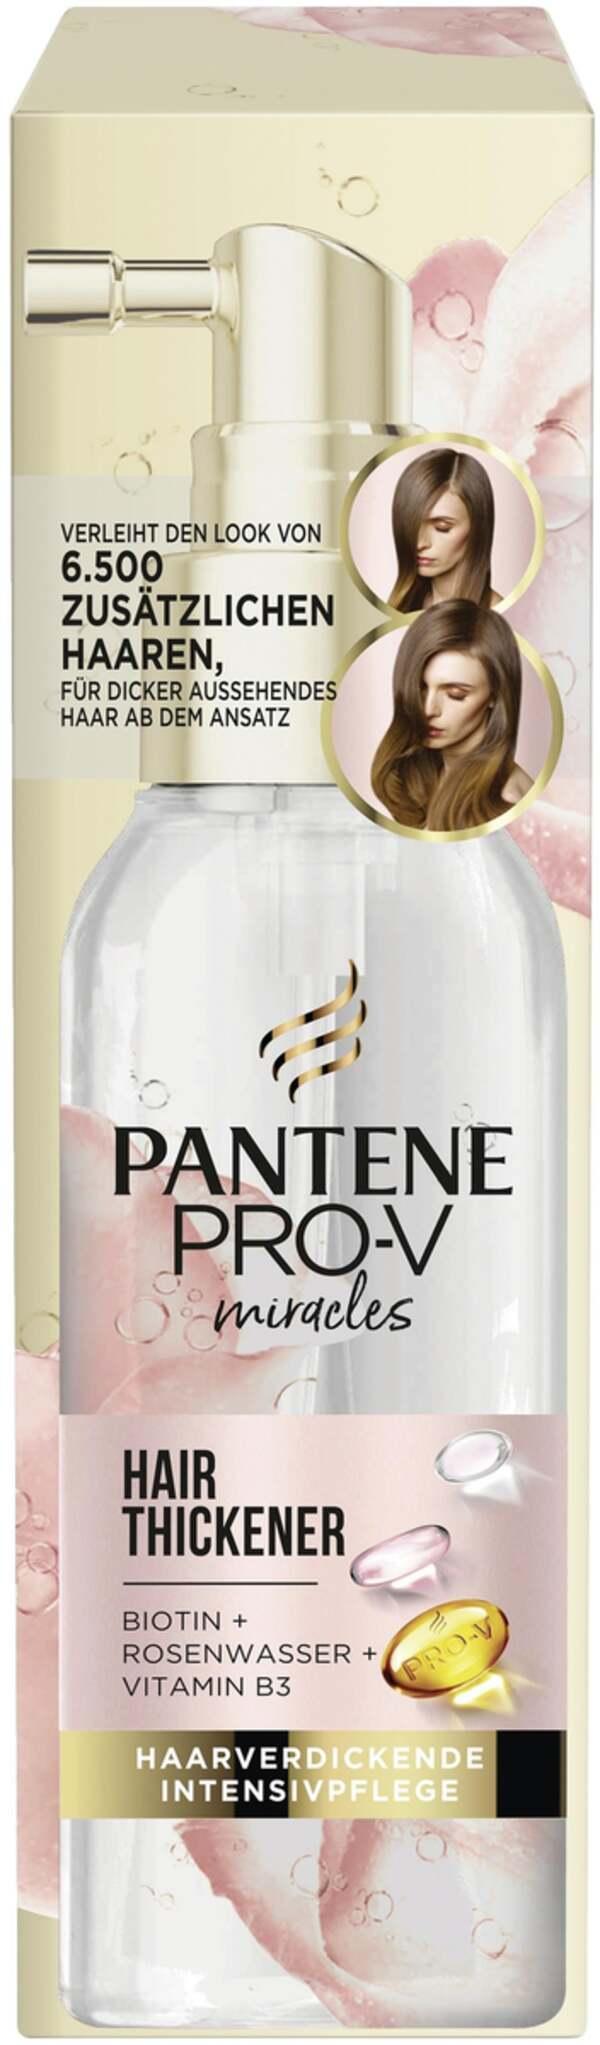 Pantene Pro-V miracles Hair Thickener